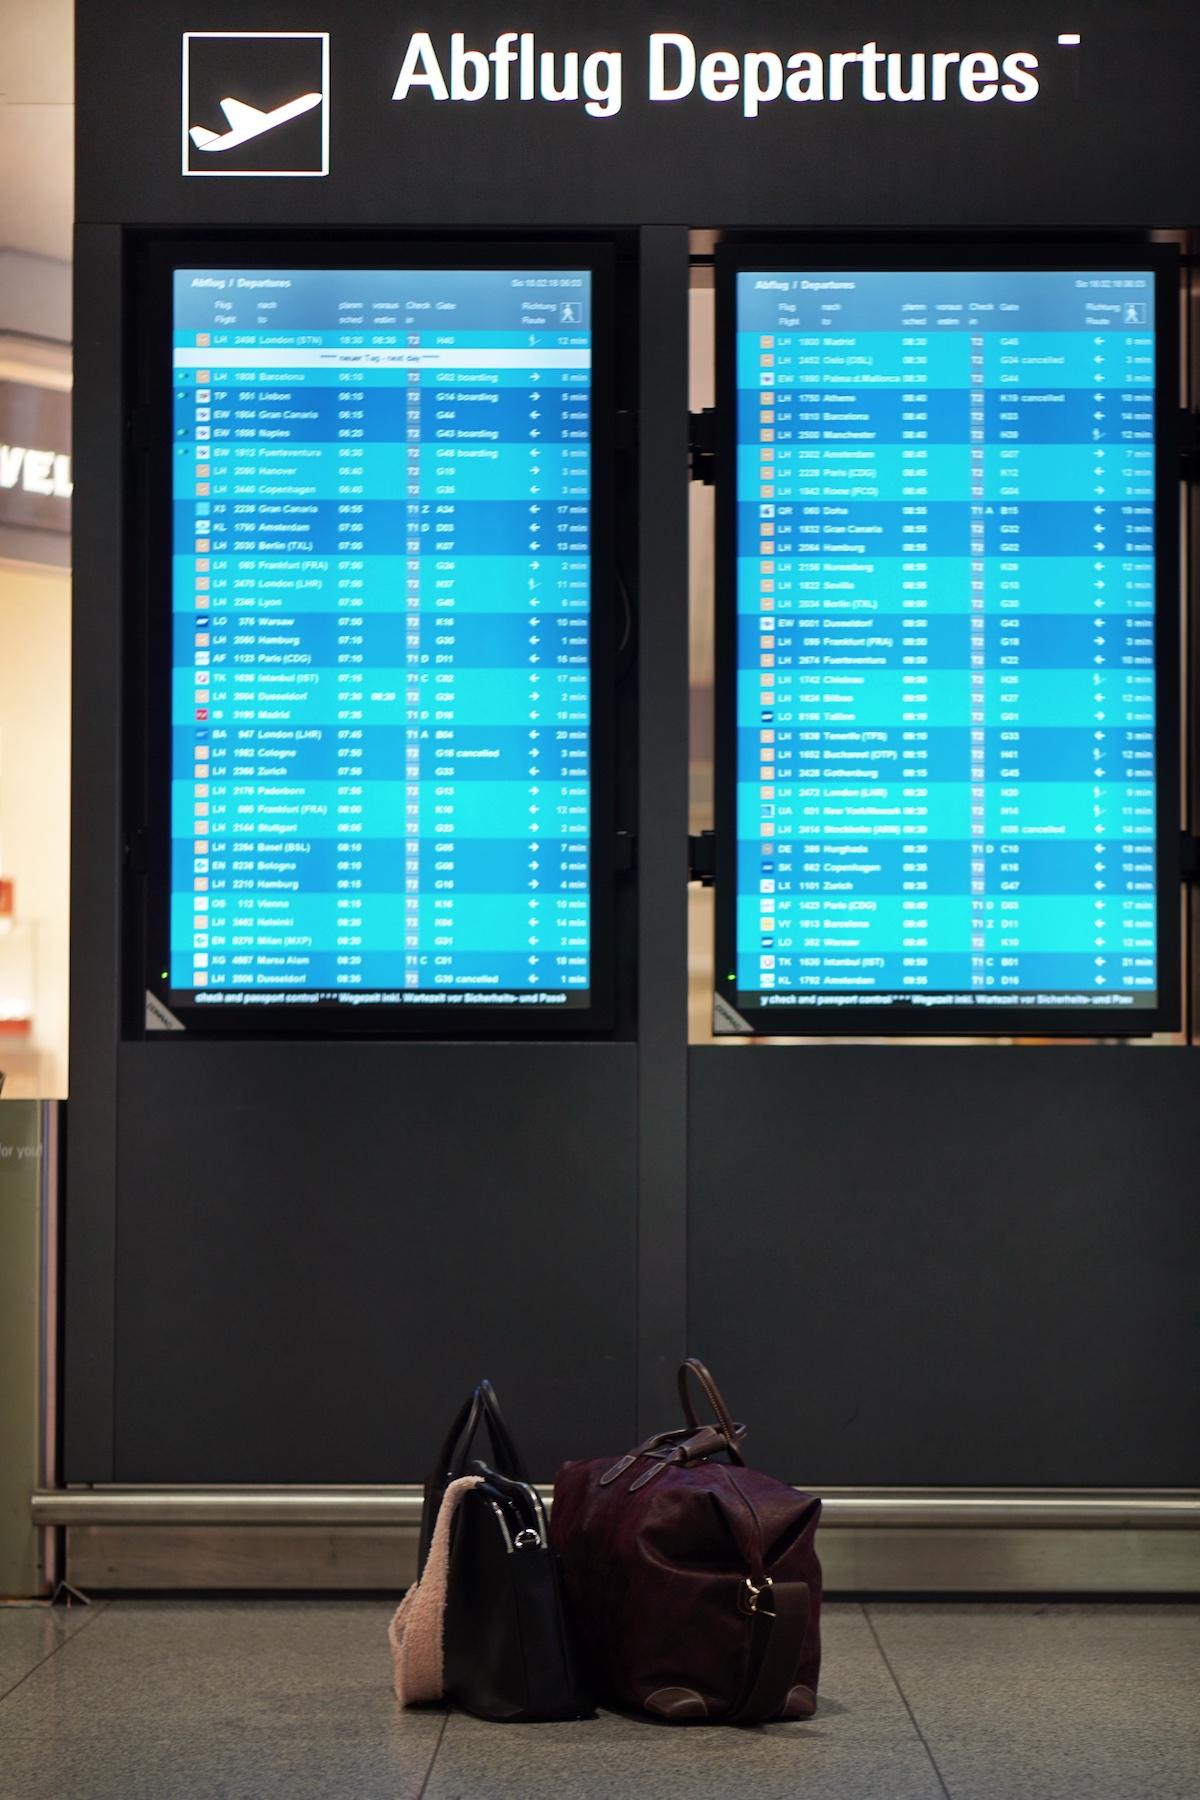 Flugreise ohne Kind - 5 Dinge die anders sind Abflug München Airport